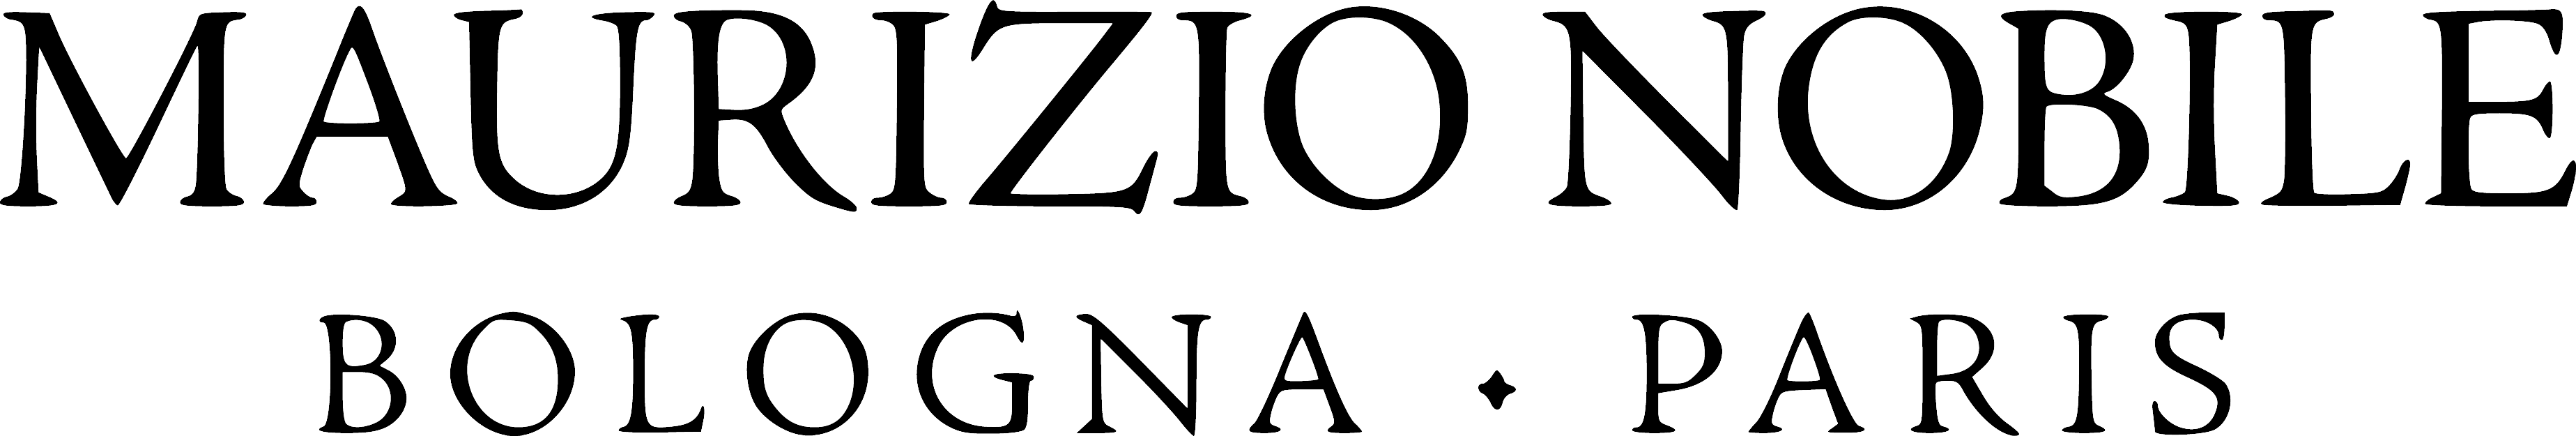 Maurizio Nobile Fine Art company logo